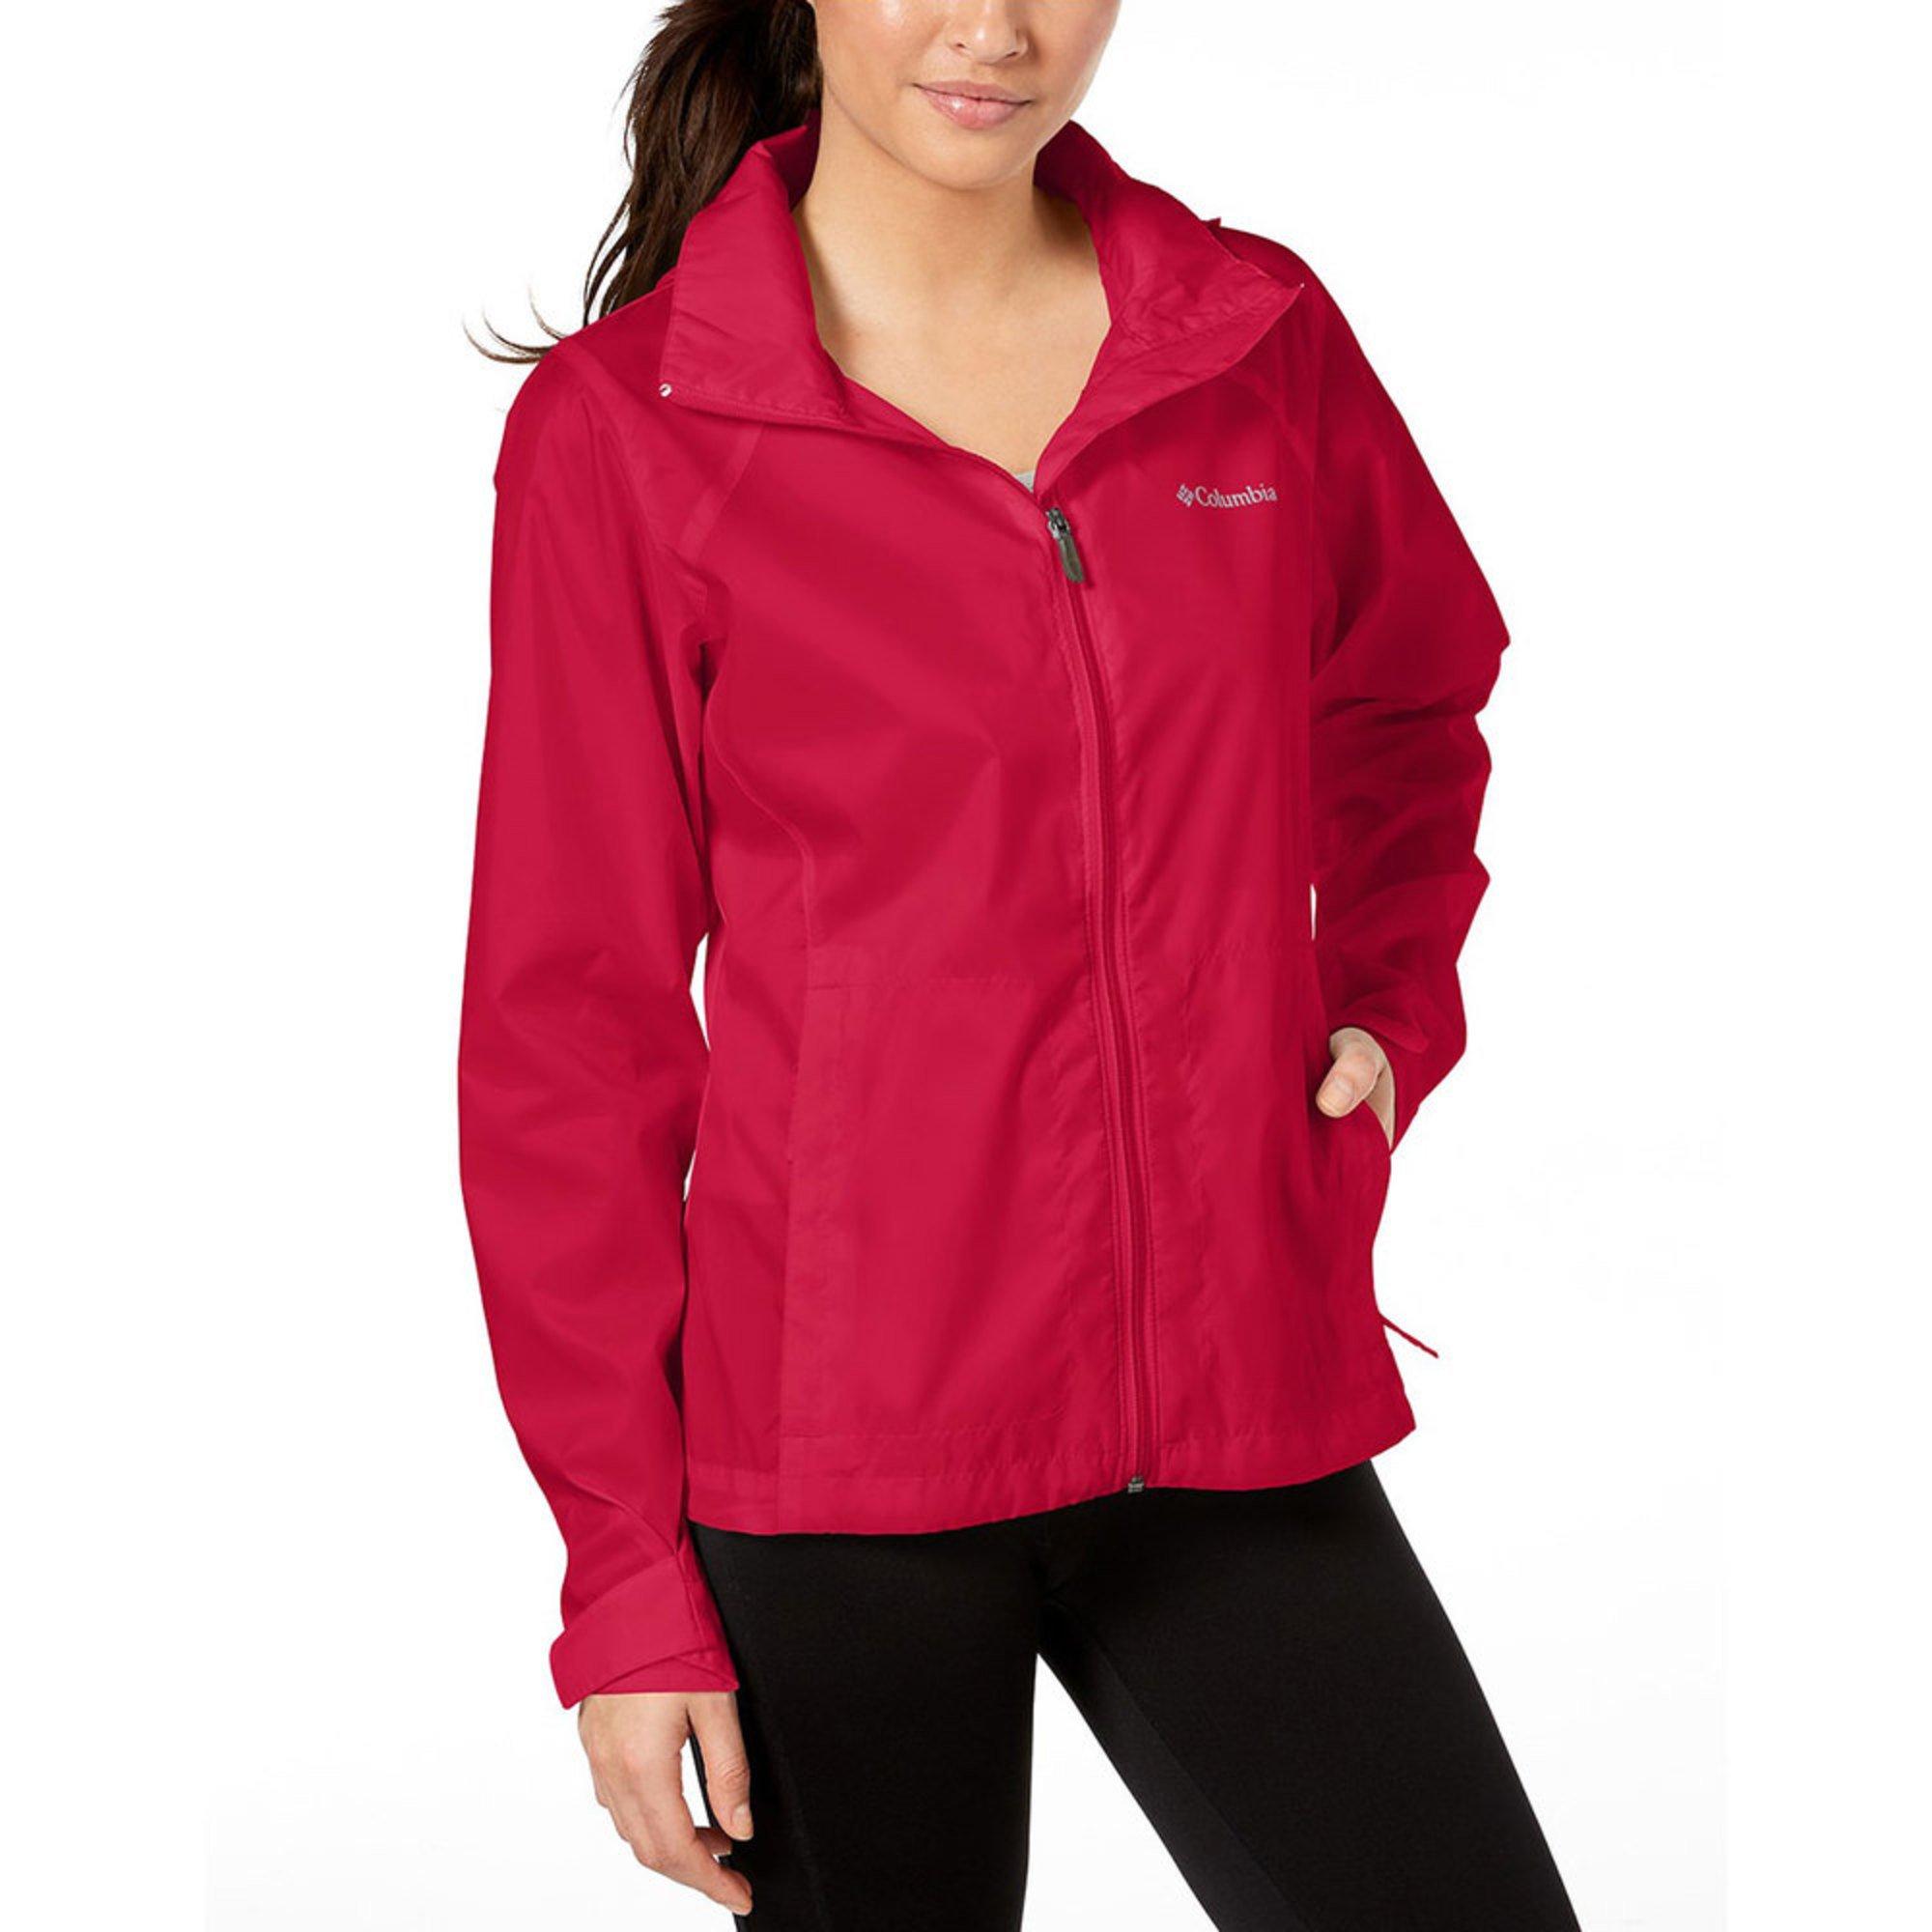 df7ed3289 Columbia Women's Switchback Ii Hooded Rain Jacket | Outdoor Jackets & Coats  | Apparel - Shop Your Navy Exchange - Official Site